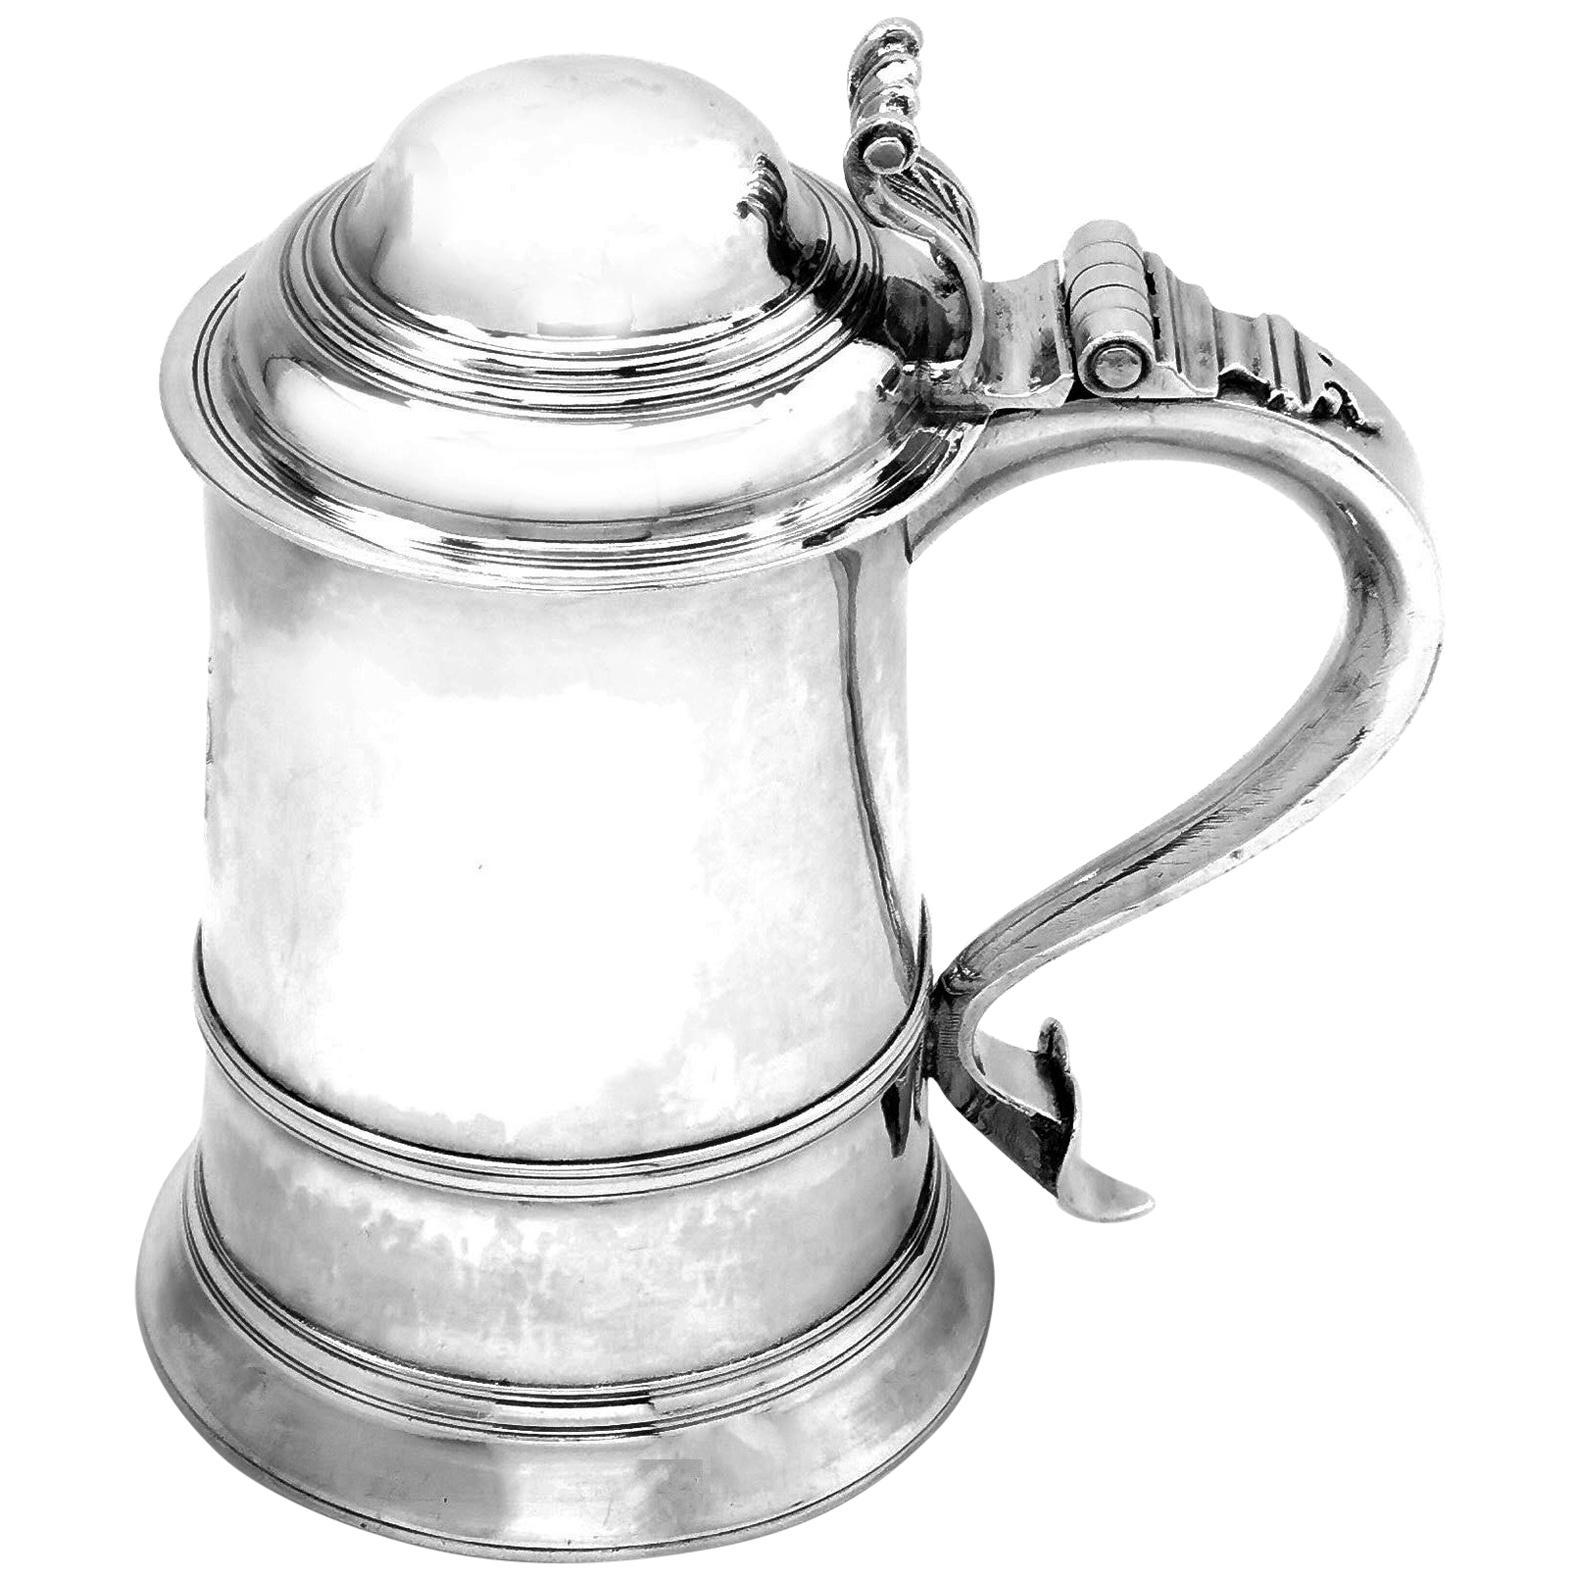 Antique Georgian Sterling Silver Lidded Tankard / Beer Mug 1771